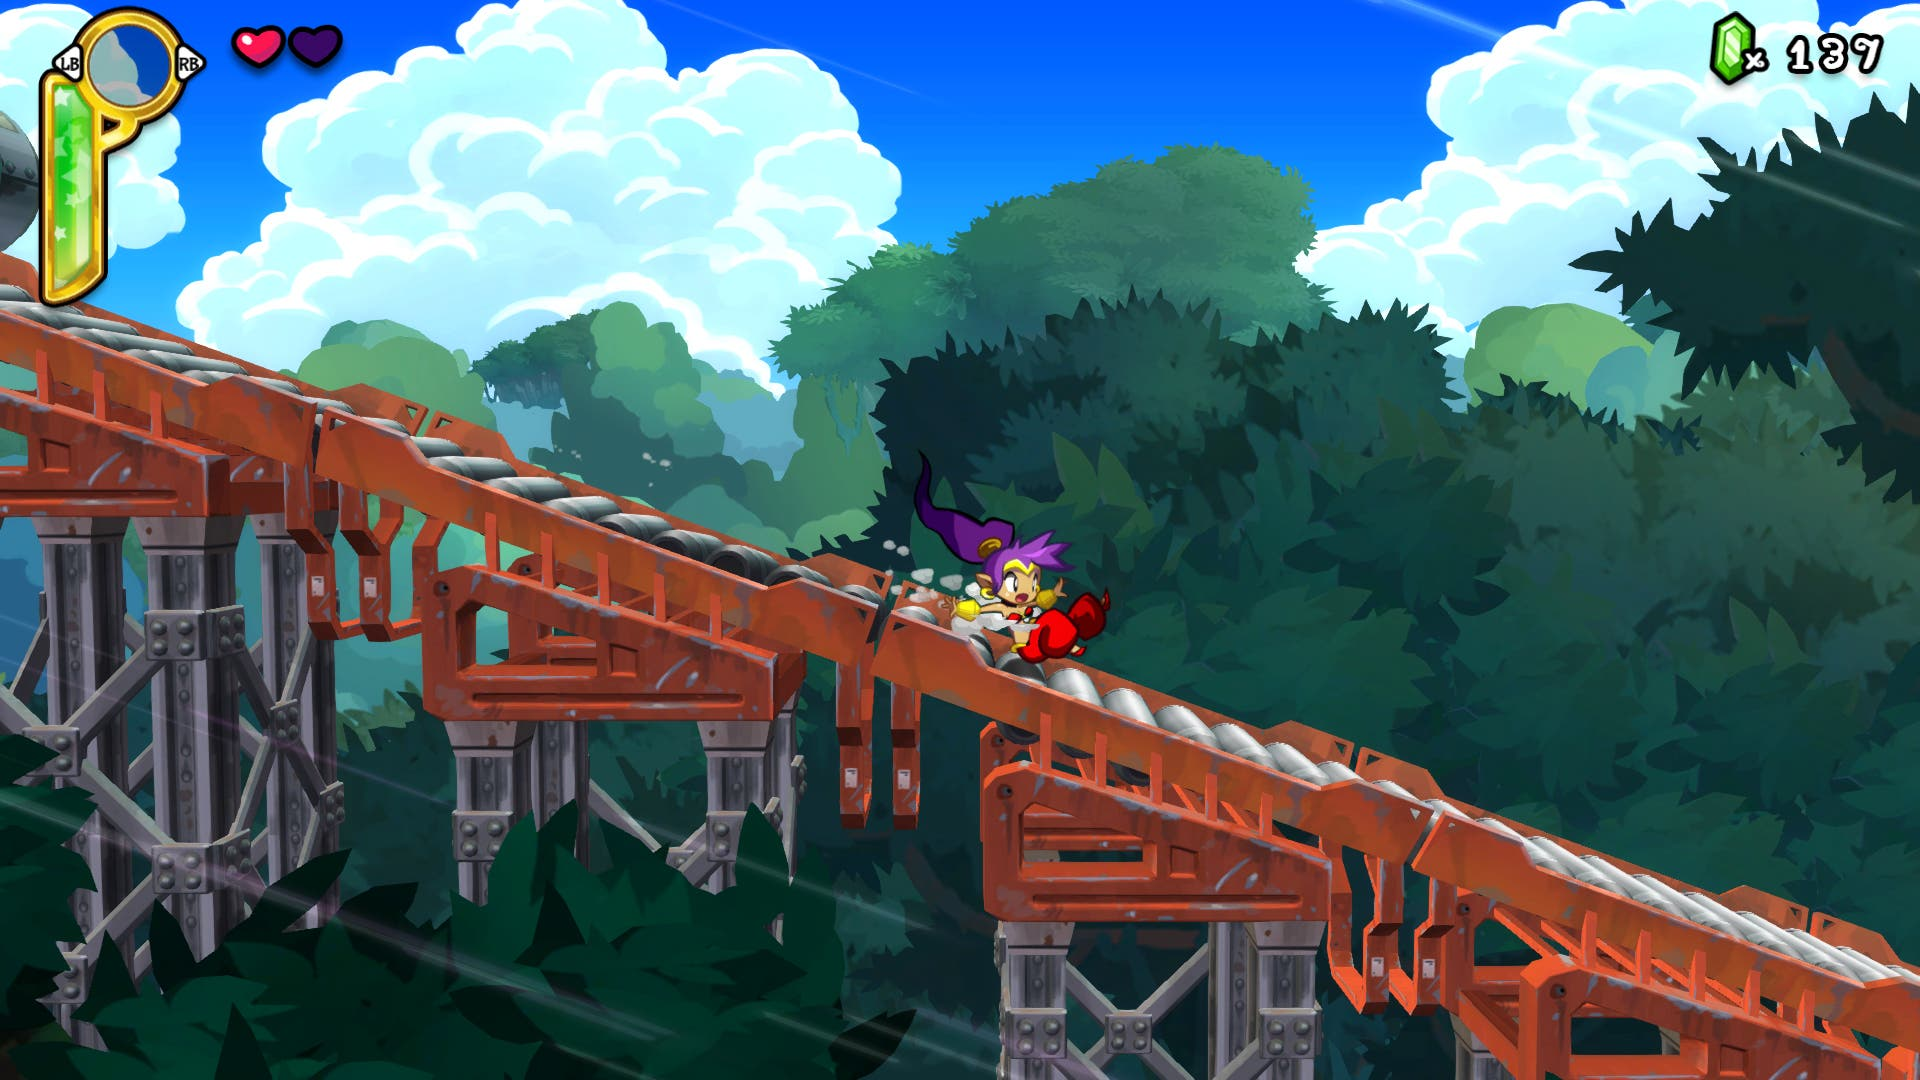 Análisis de Shantae Half-Genie Hero 1